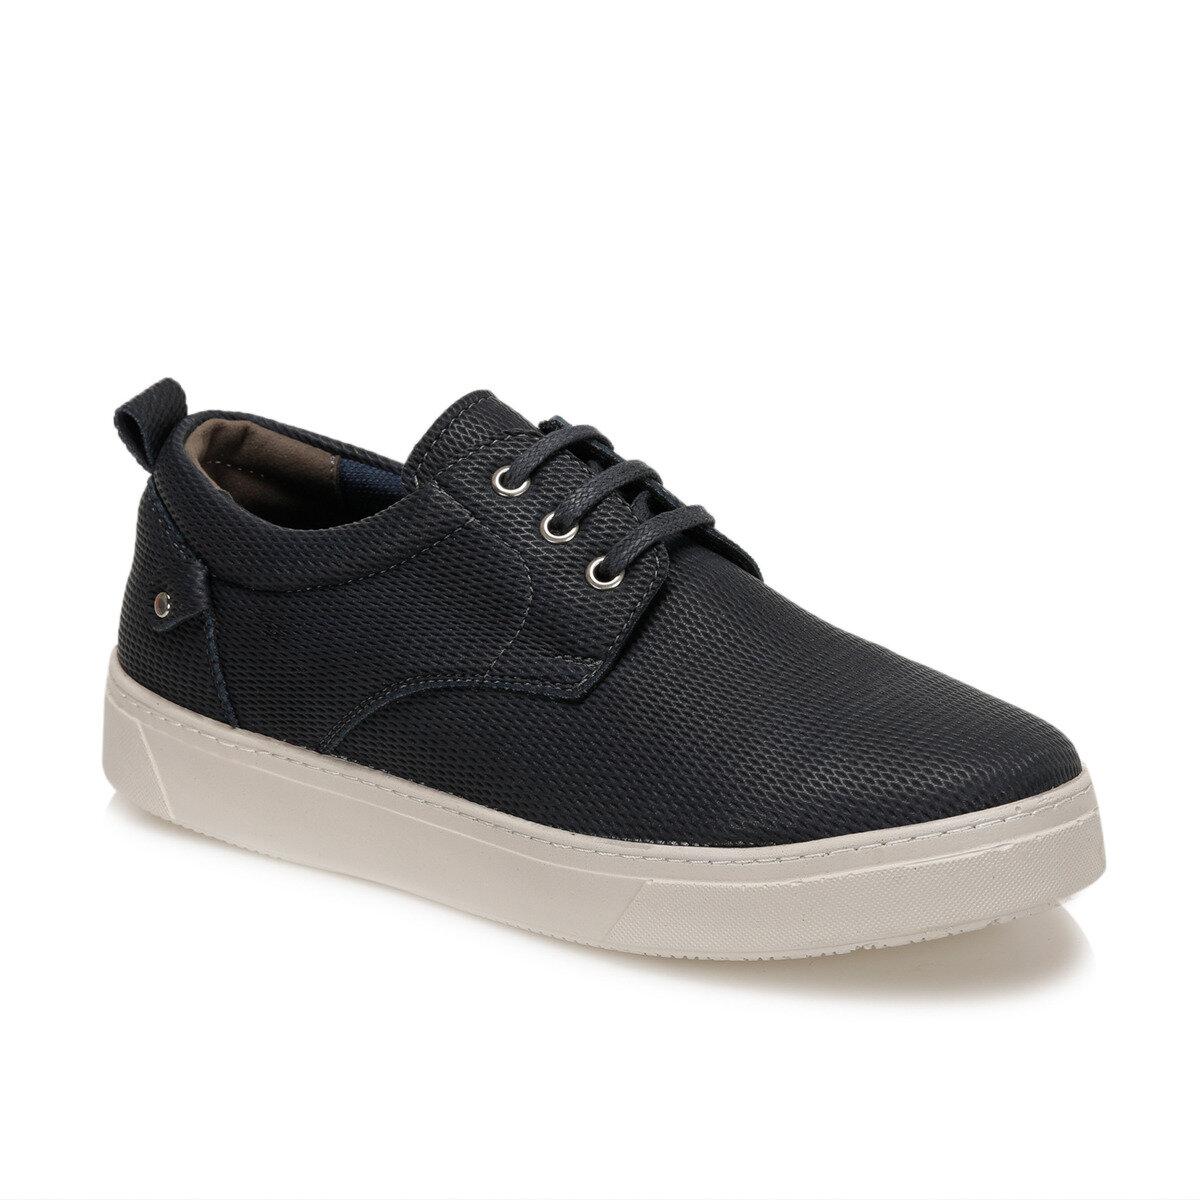 FLO NM-01 Navy Blue Men S Shoes Panama Club